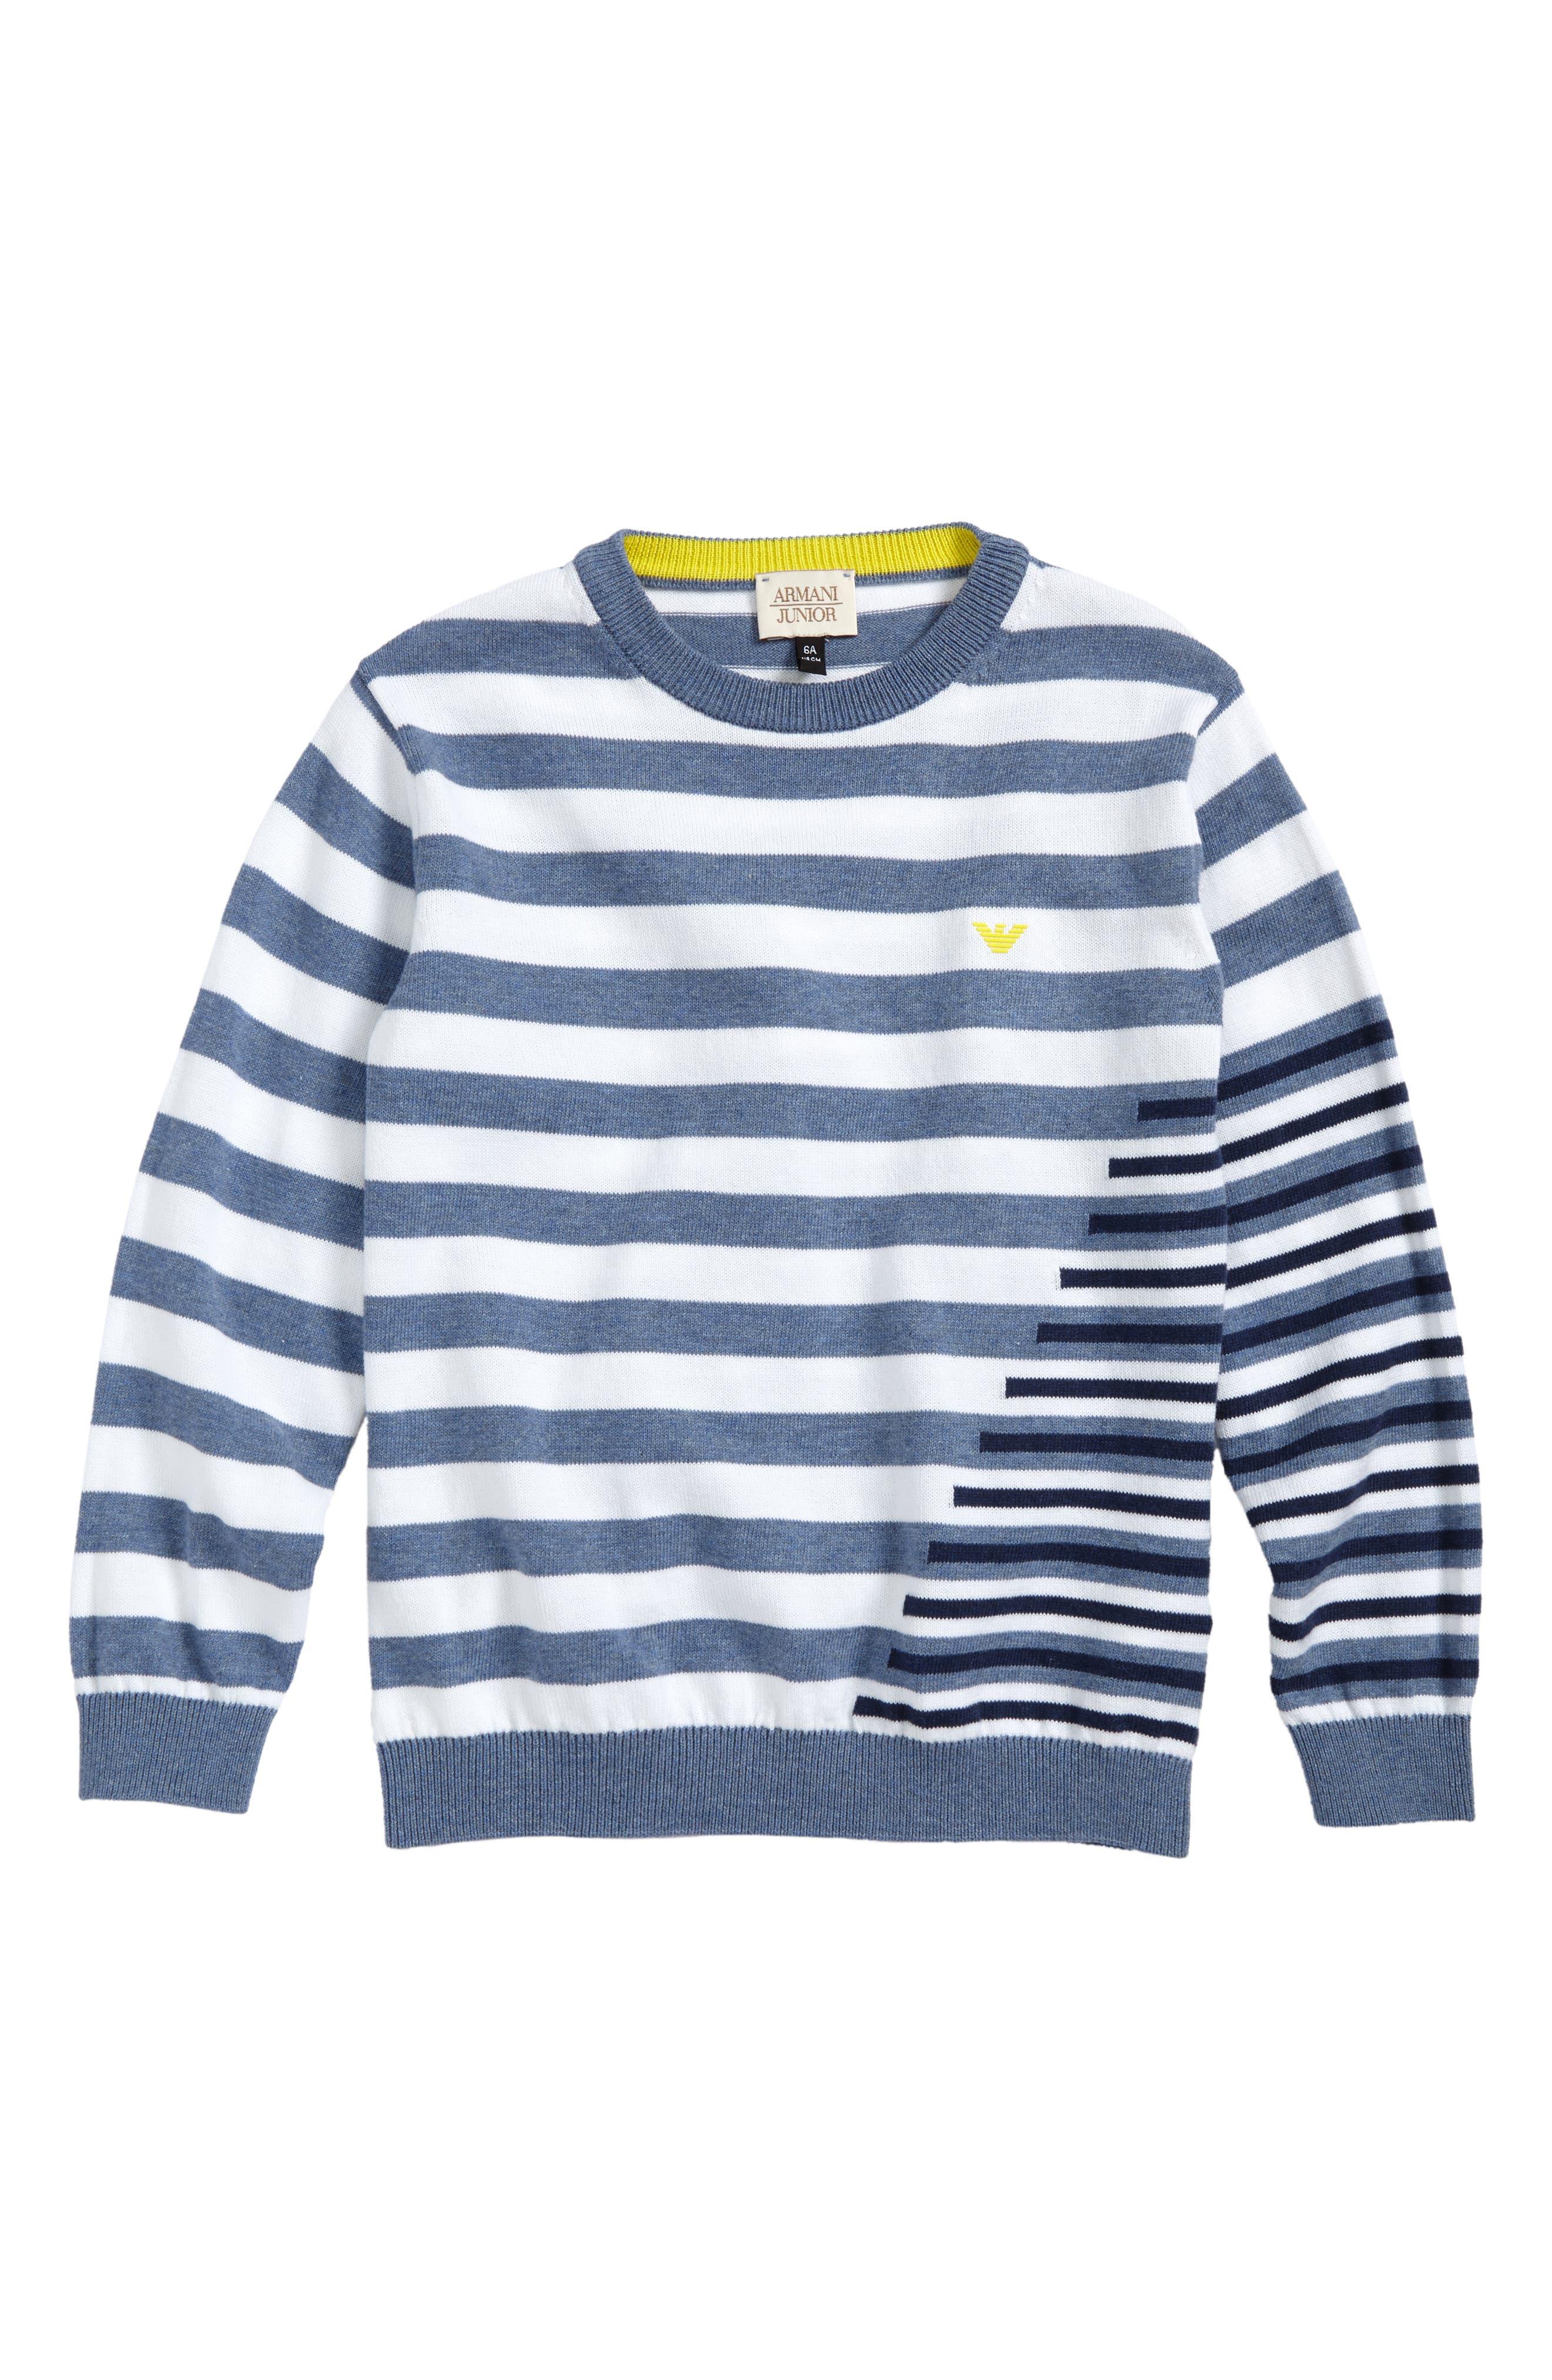 Stripe Cotton Sweater,                             Main thumbnail 1, color,                             Blue/ White